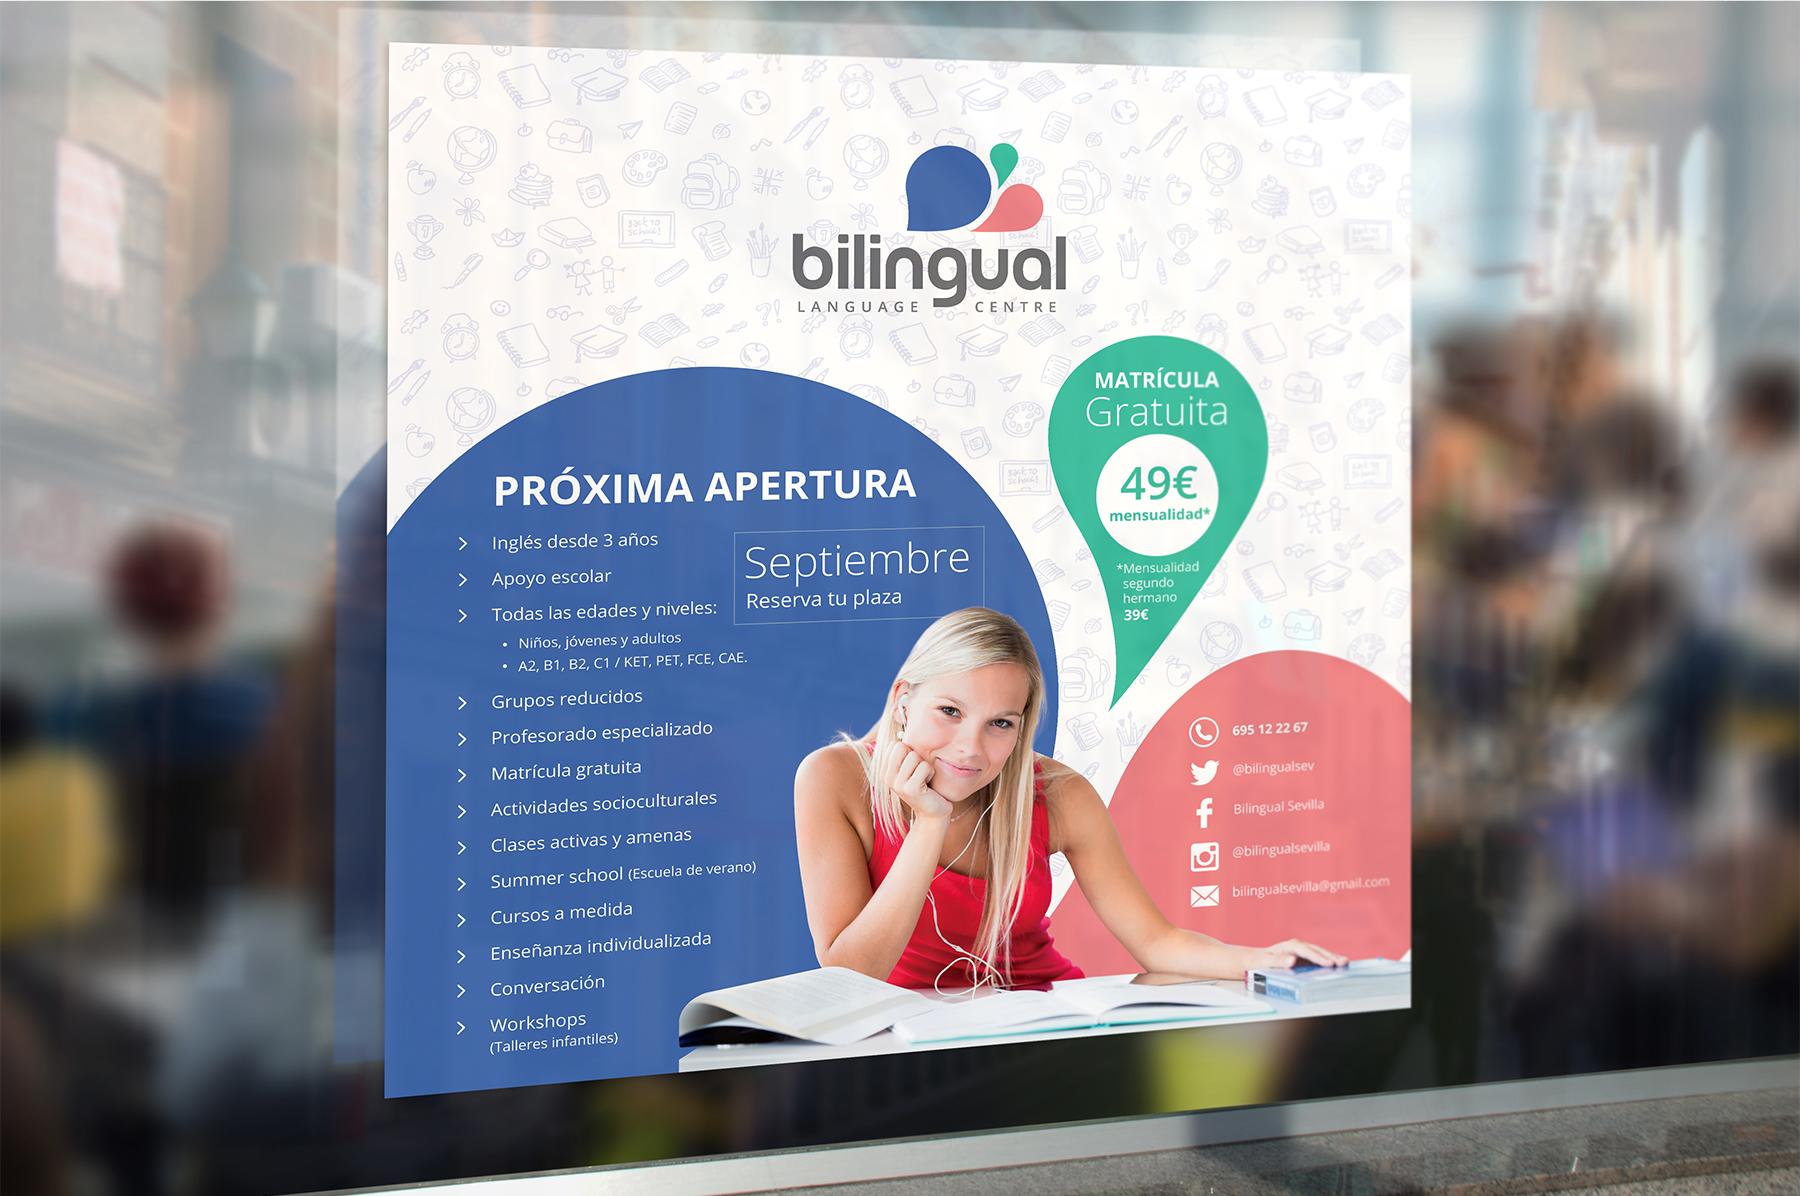 bilingual5